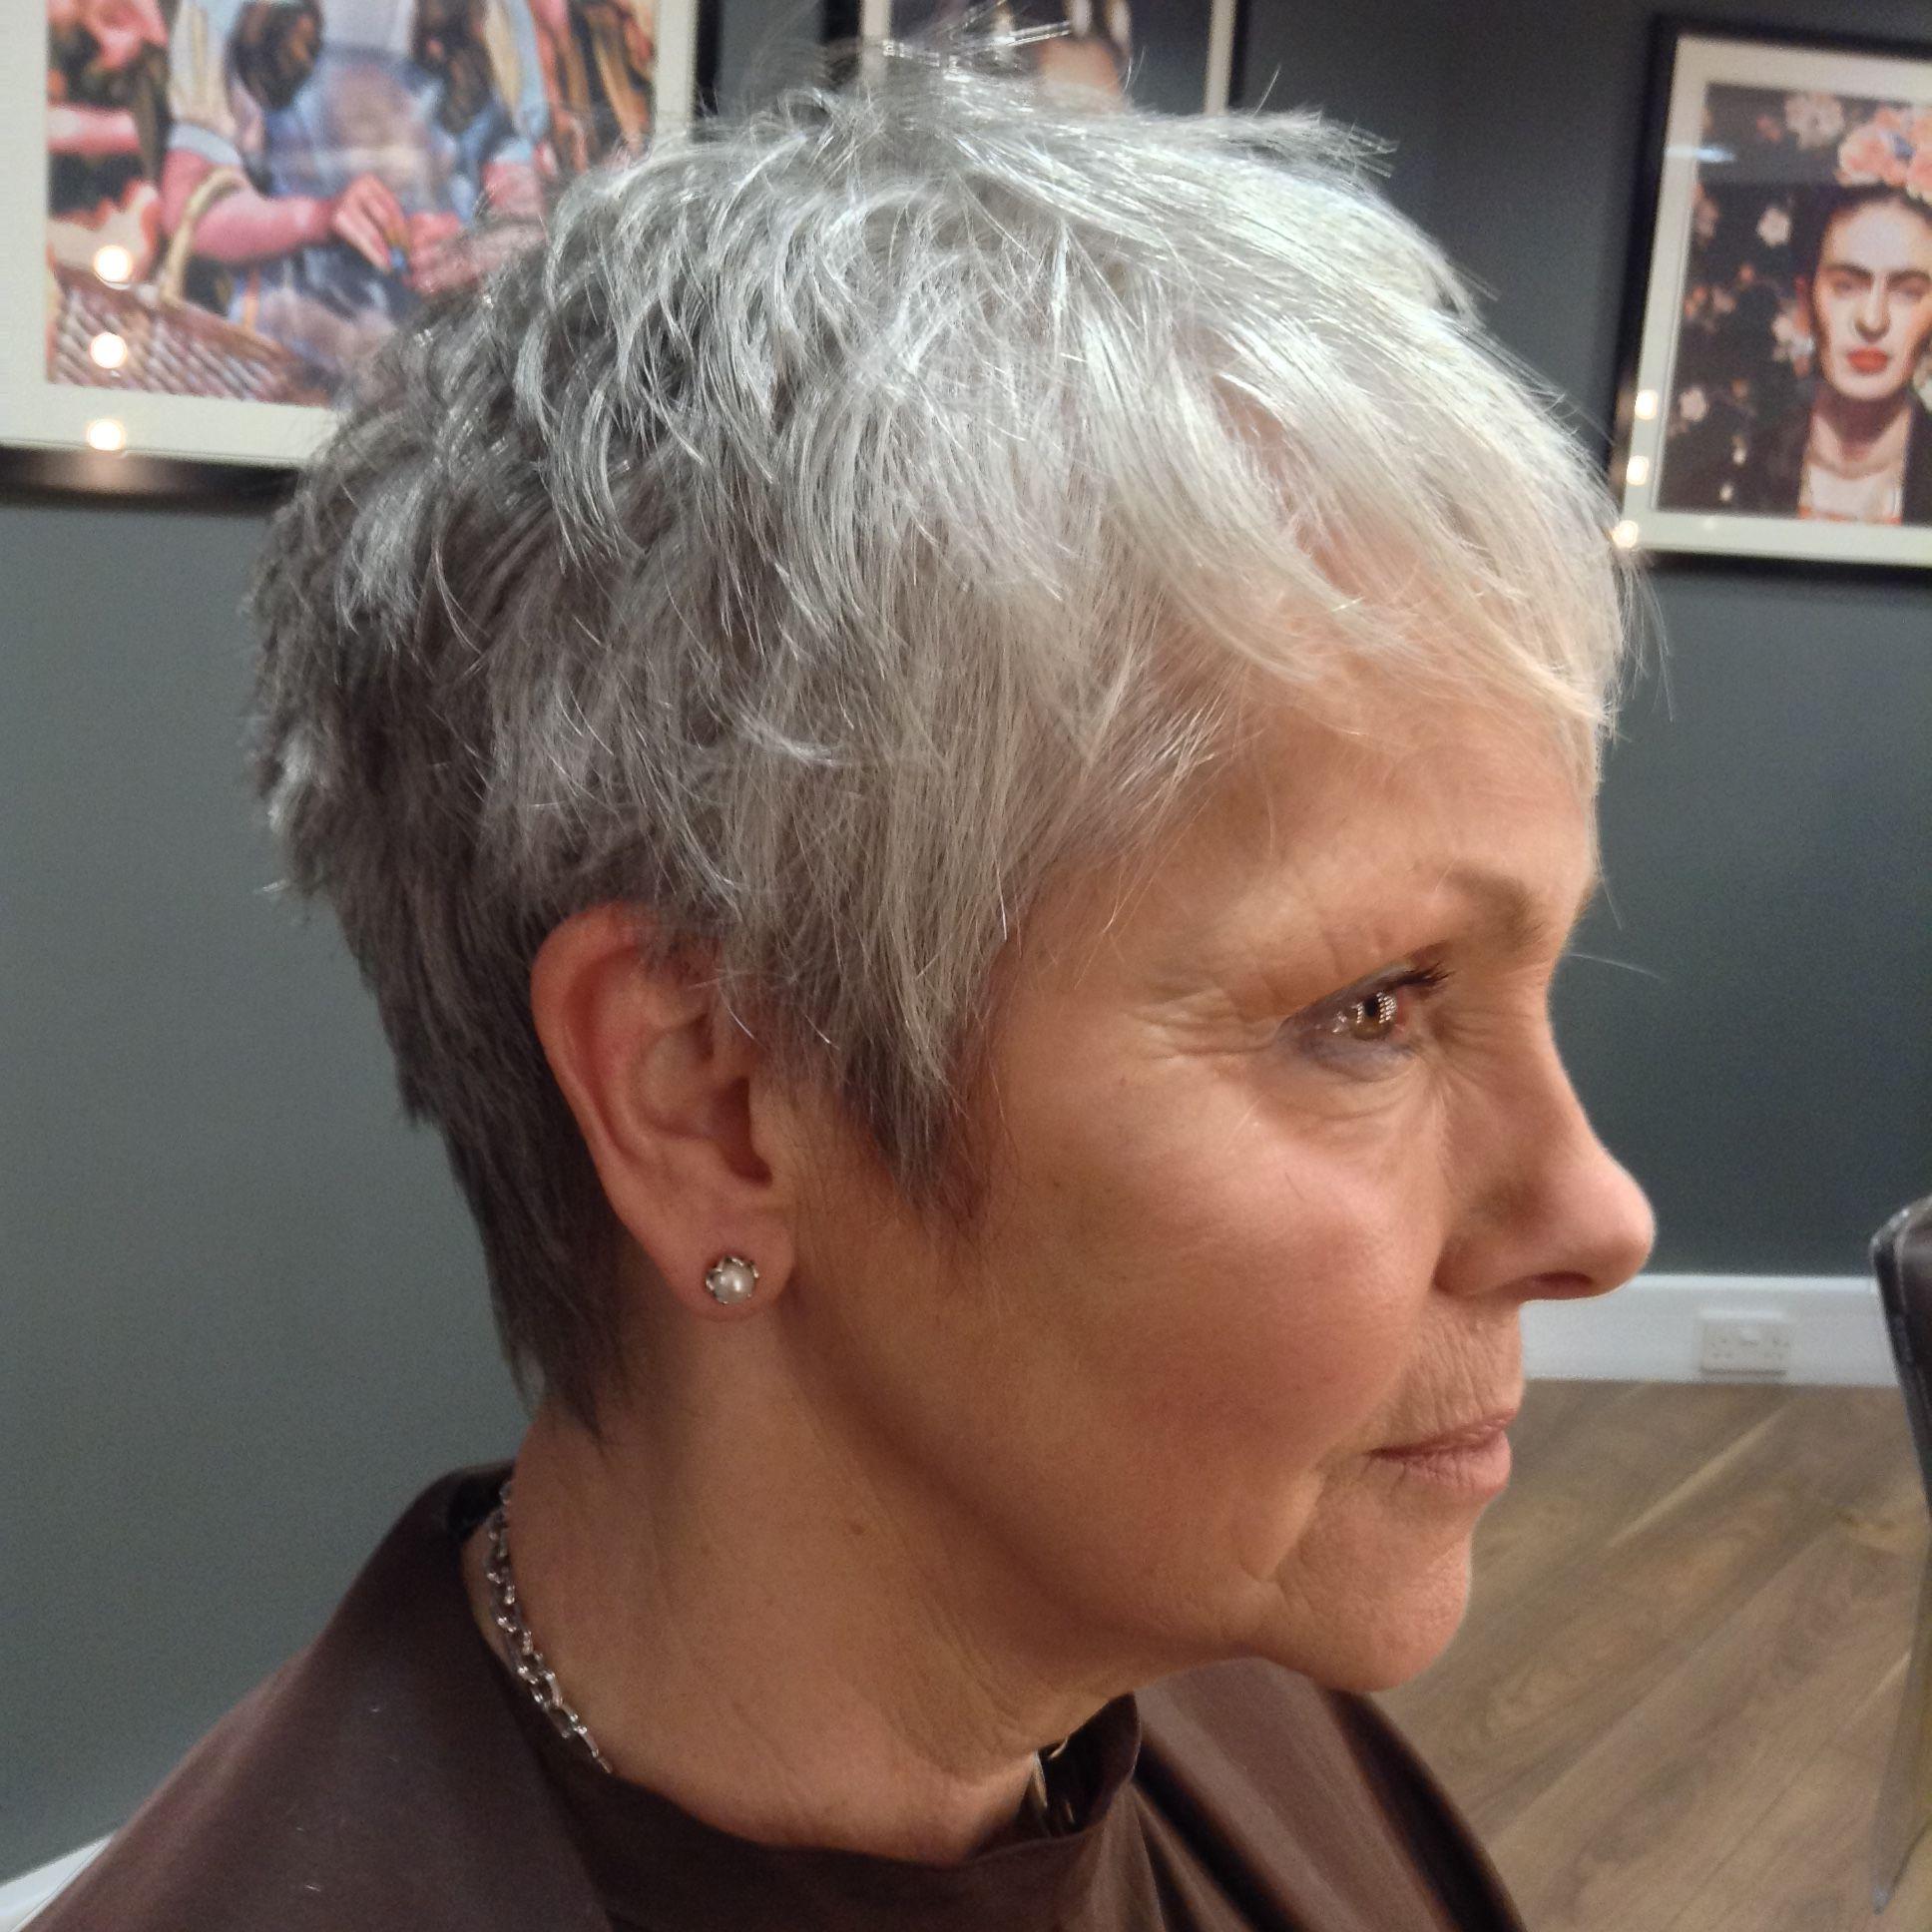 Beautiful Natural Grey Hair With A Short Textured Haircut Short Thin Hair Hairstyles For Thin Hair Short Hair Older Women